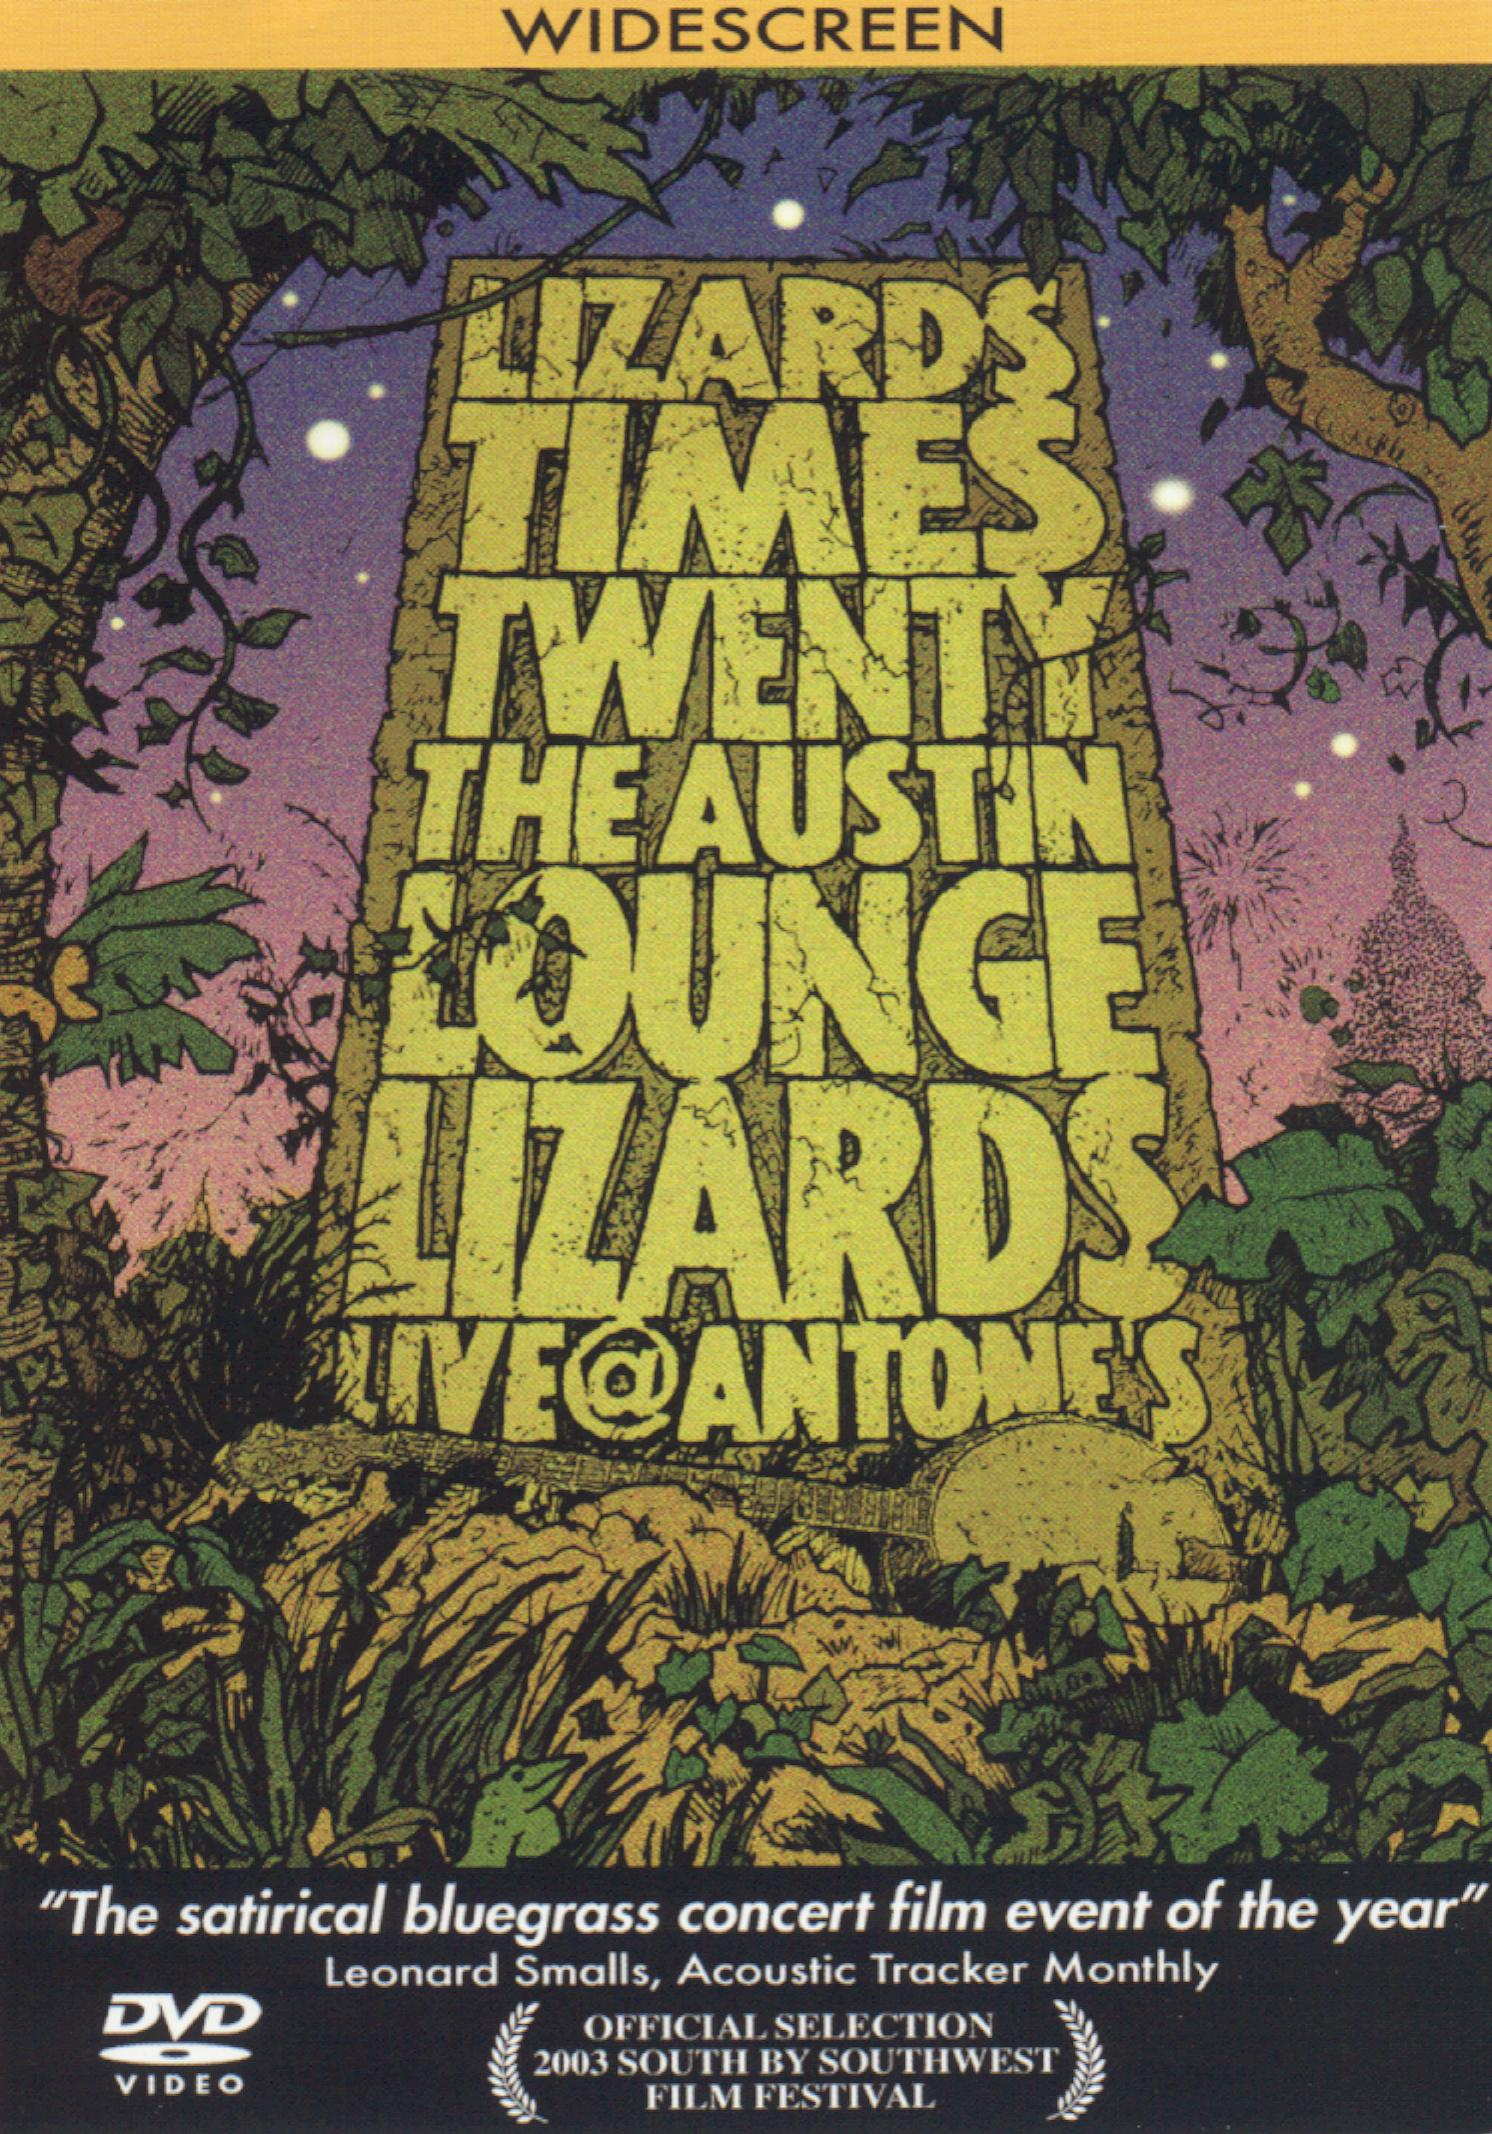 Lizard Times Twenty: The Austin Lounge Lizards - Live at Antone's